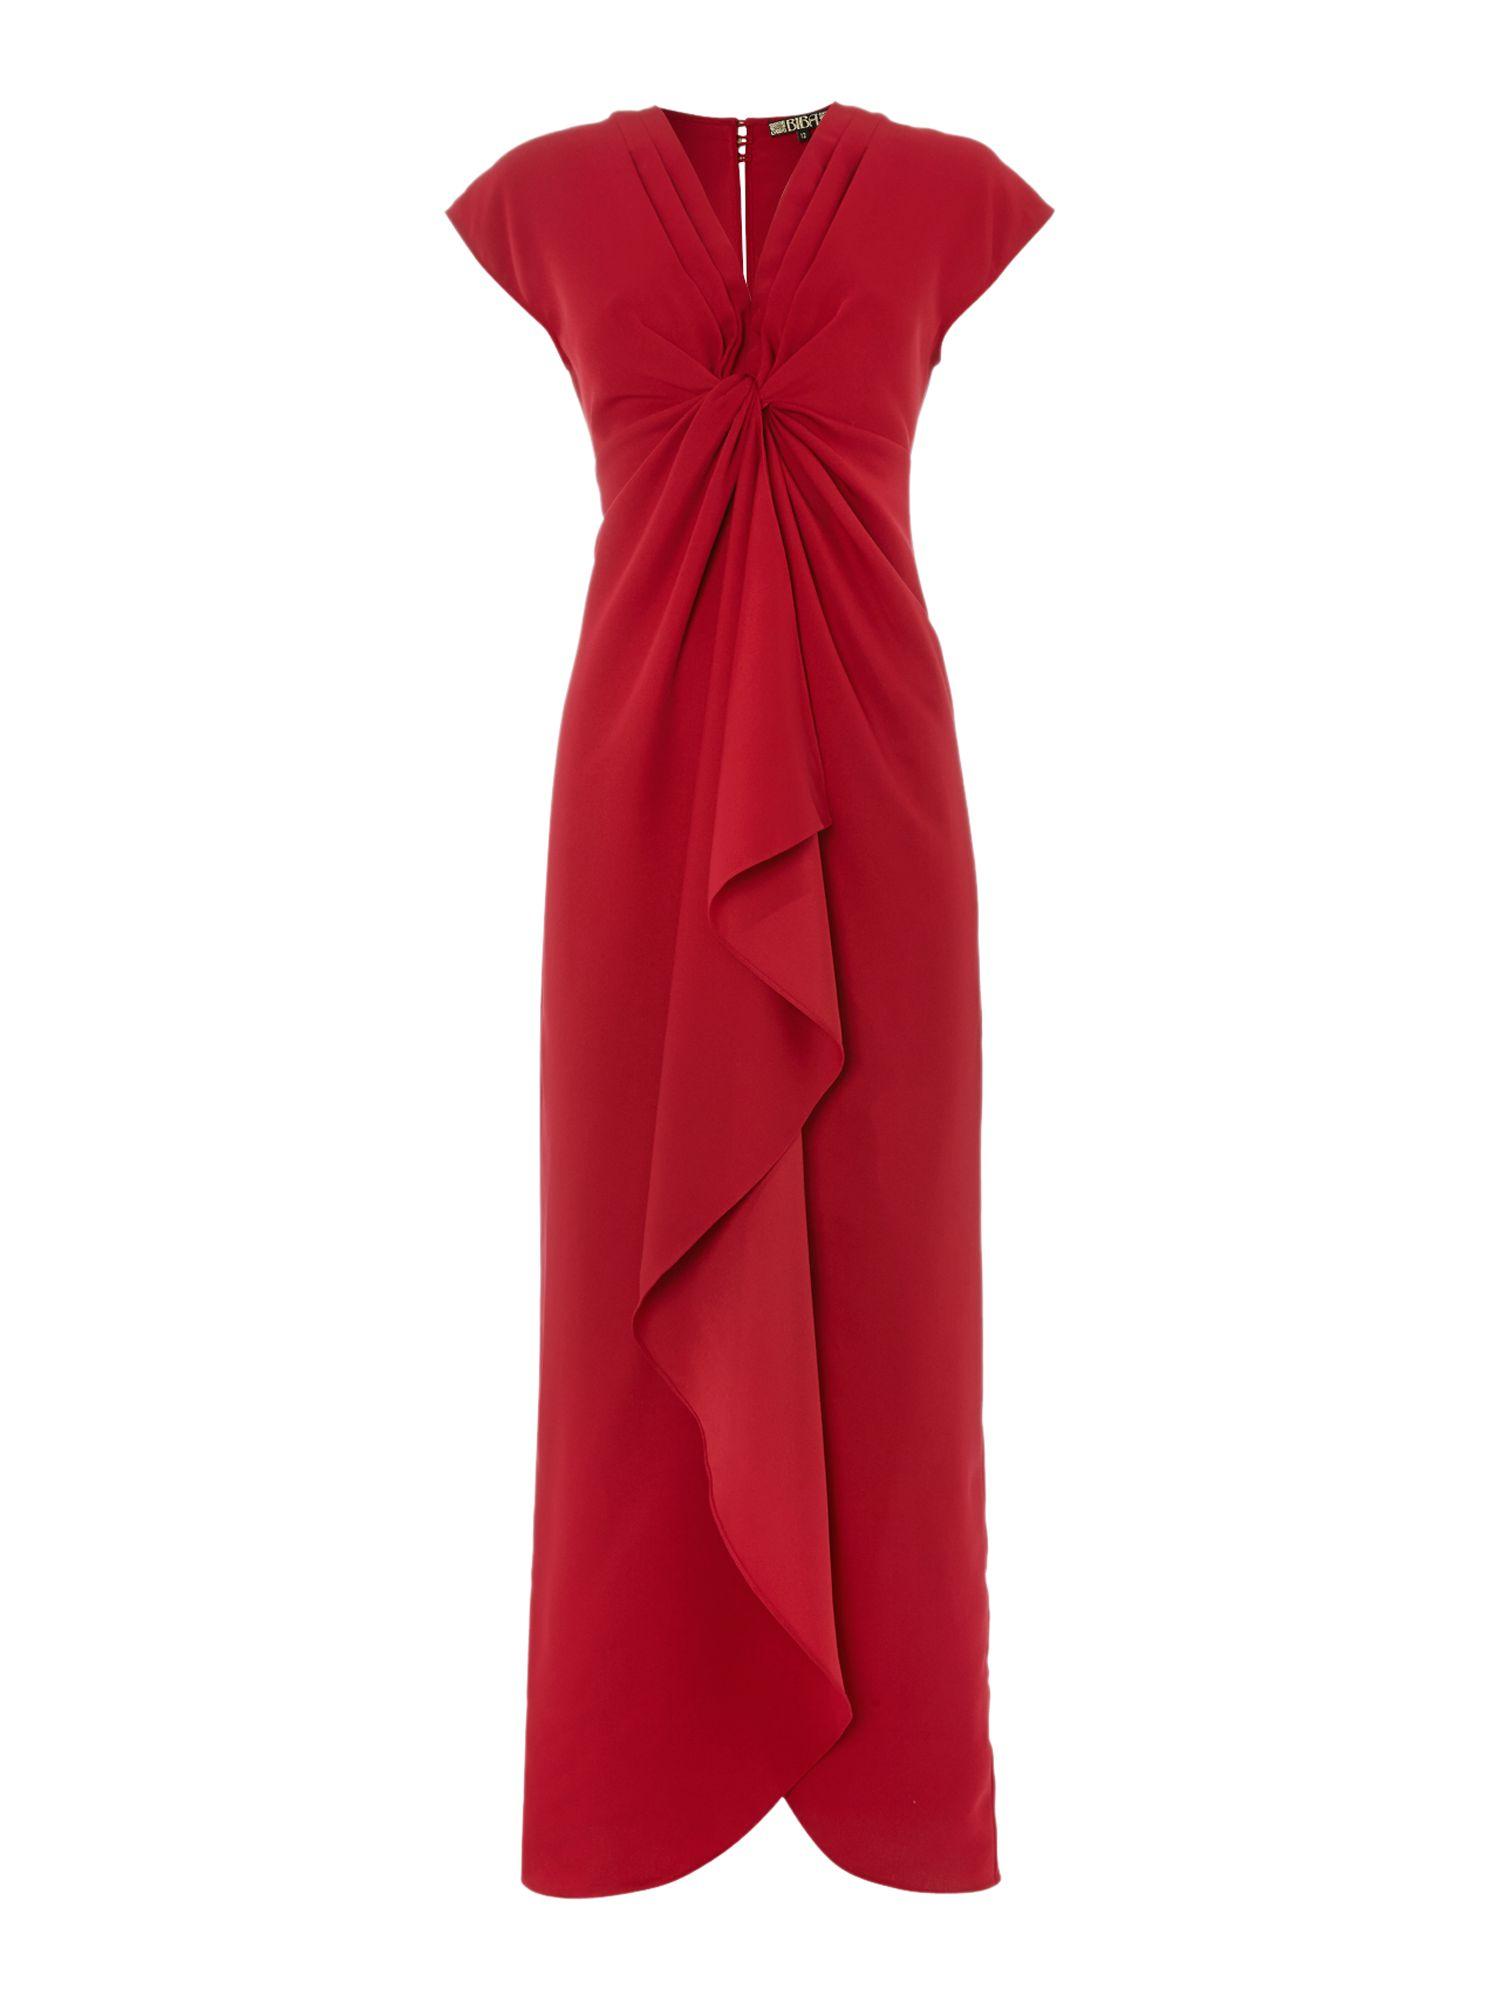 Biba waterfall maxi dress in red cranberry lyst for Waterfall design dress